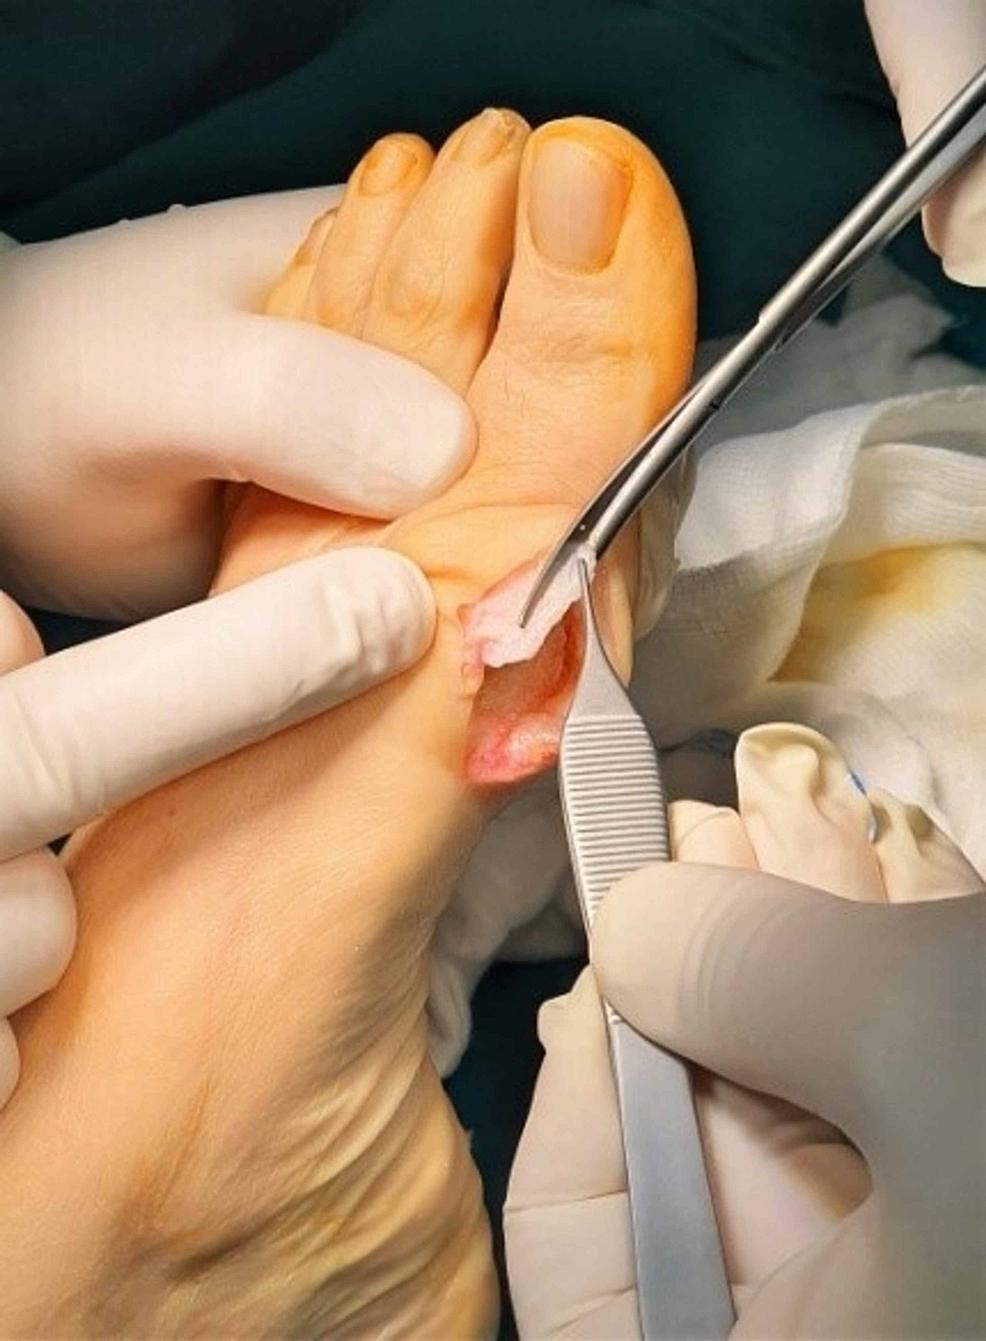 Excision-of-the-excessive-capsular-tissue.